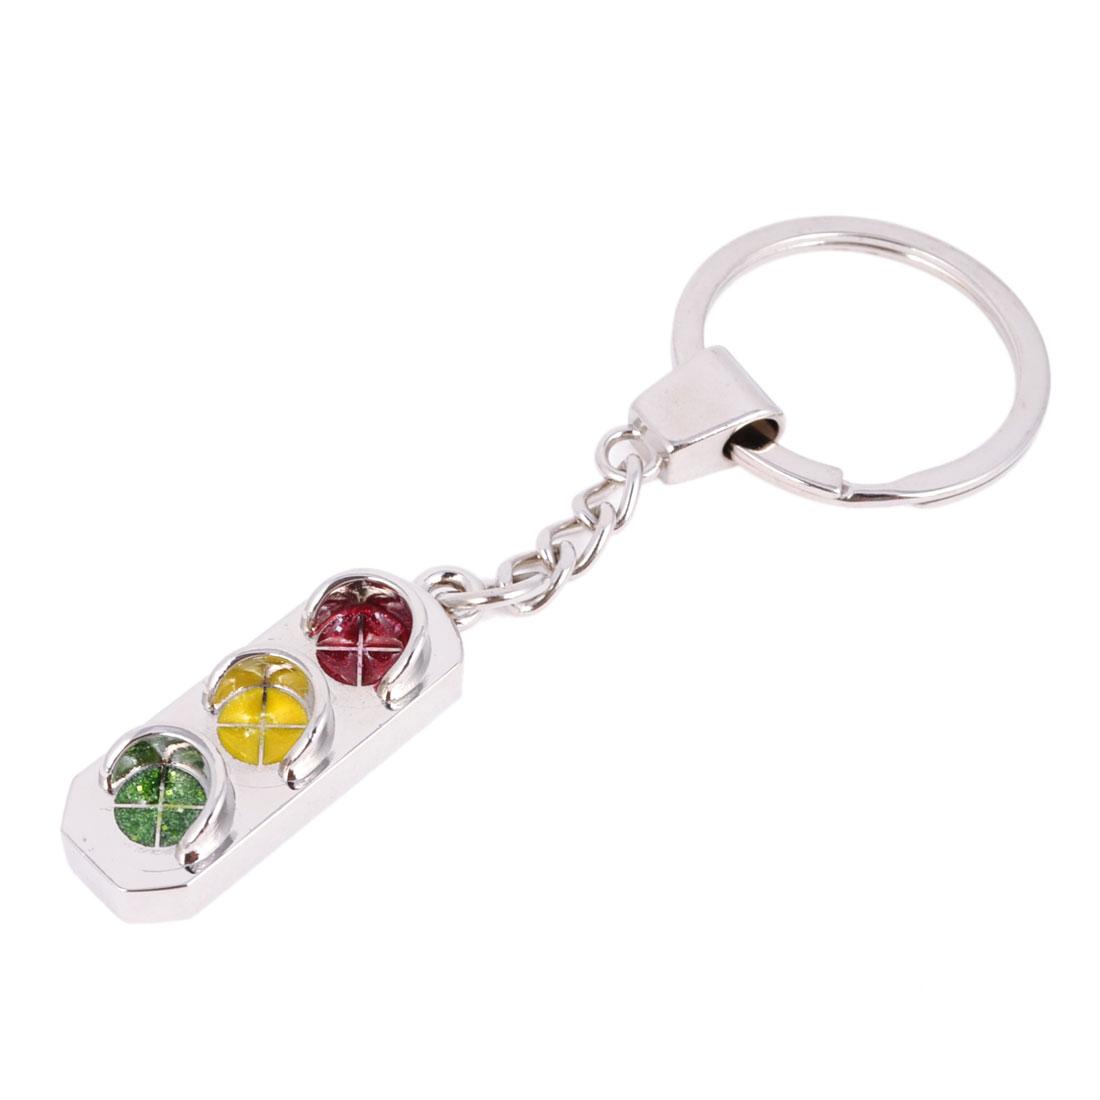 Split Ring Traffic Light Design Dangle Pendant Keychain Silver Tone